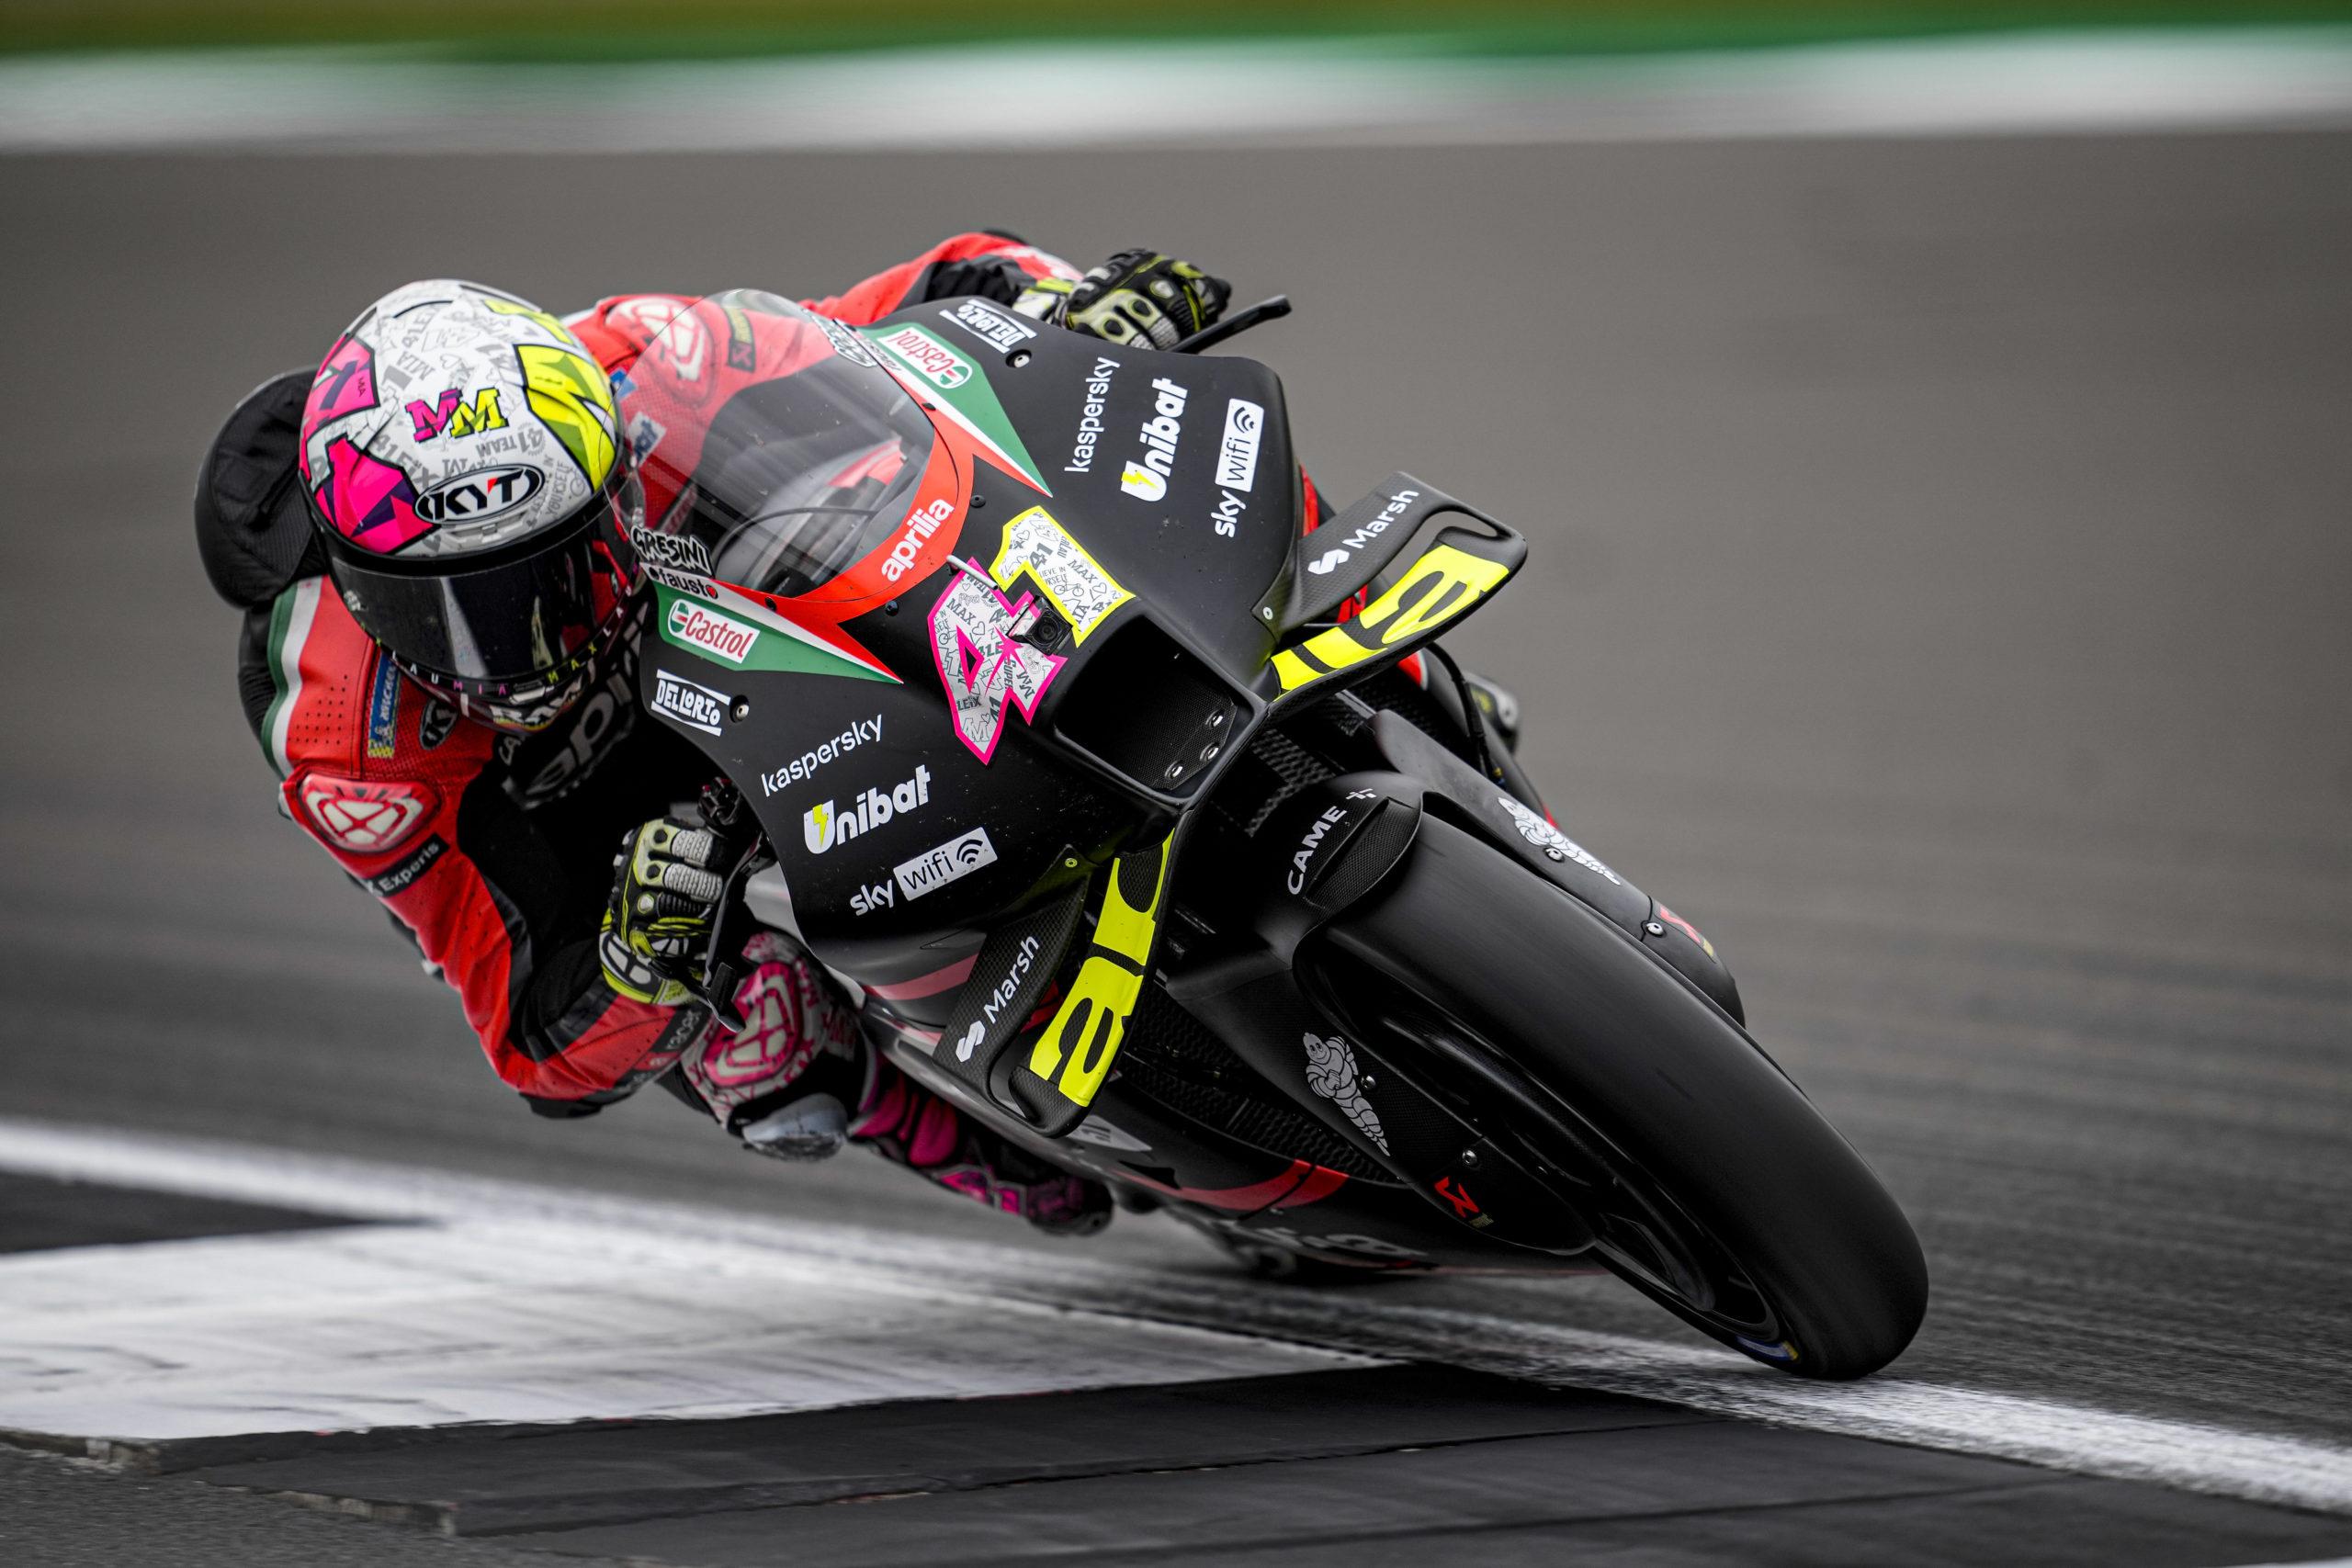 41,Aleix Espargaro,SPANISH,Aprilia Racing Team Gresini,Aprilia,MotoGP,KYT,Ixon,FormaBoots,